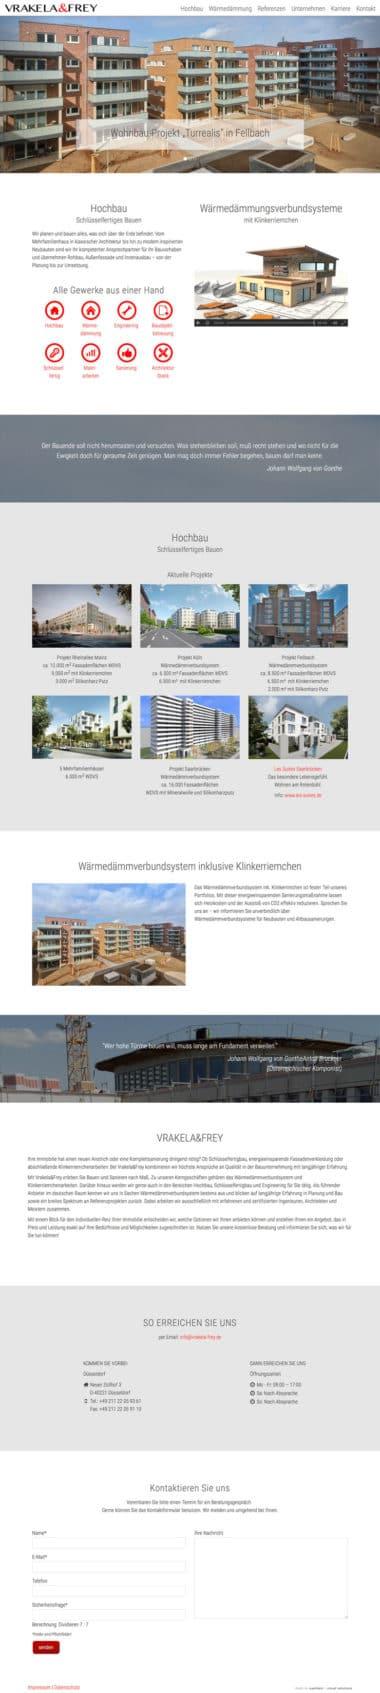 Webdesign Architektur Immobilien - Vrakela & Frey Bauunternehmen